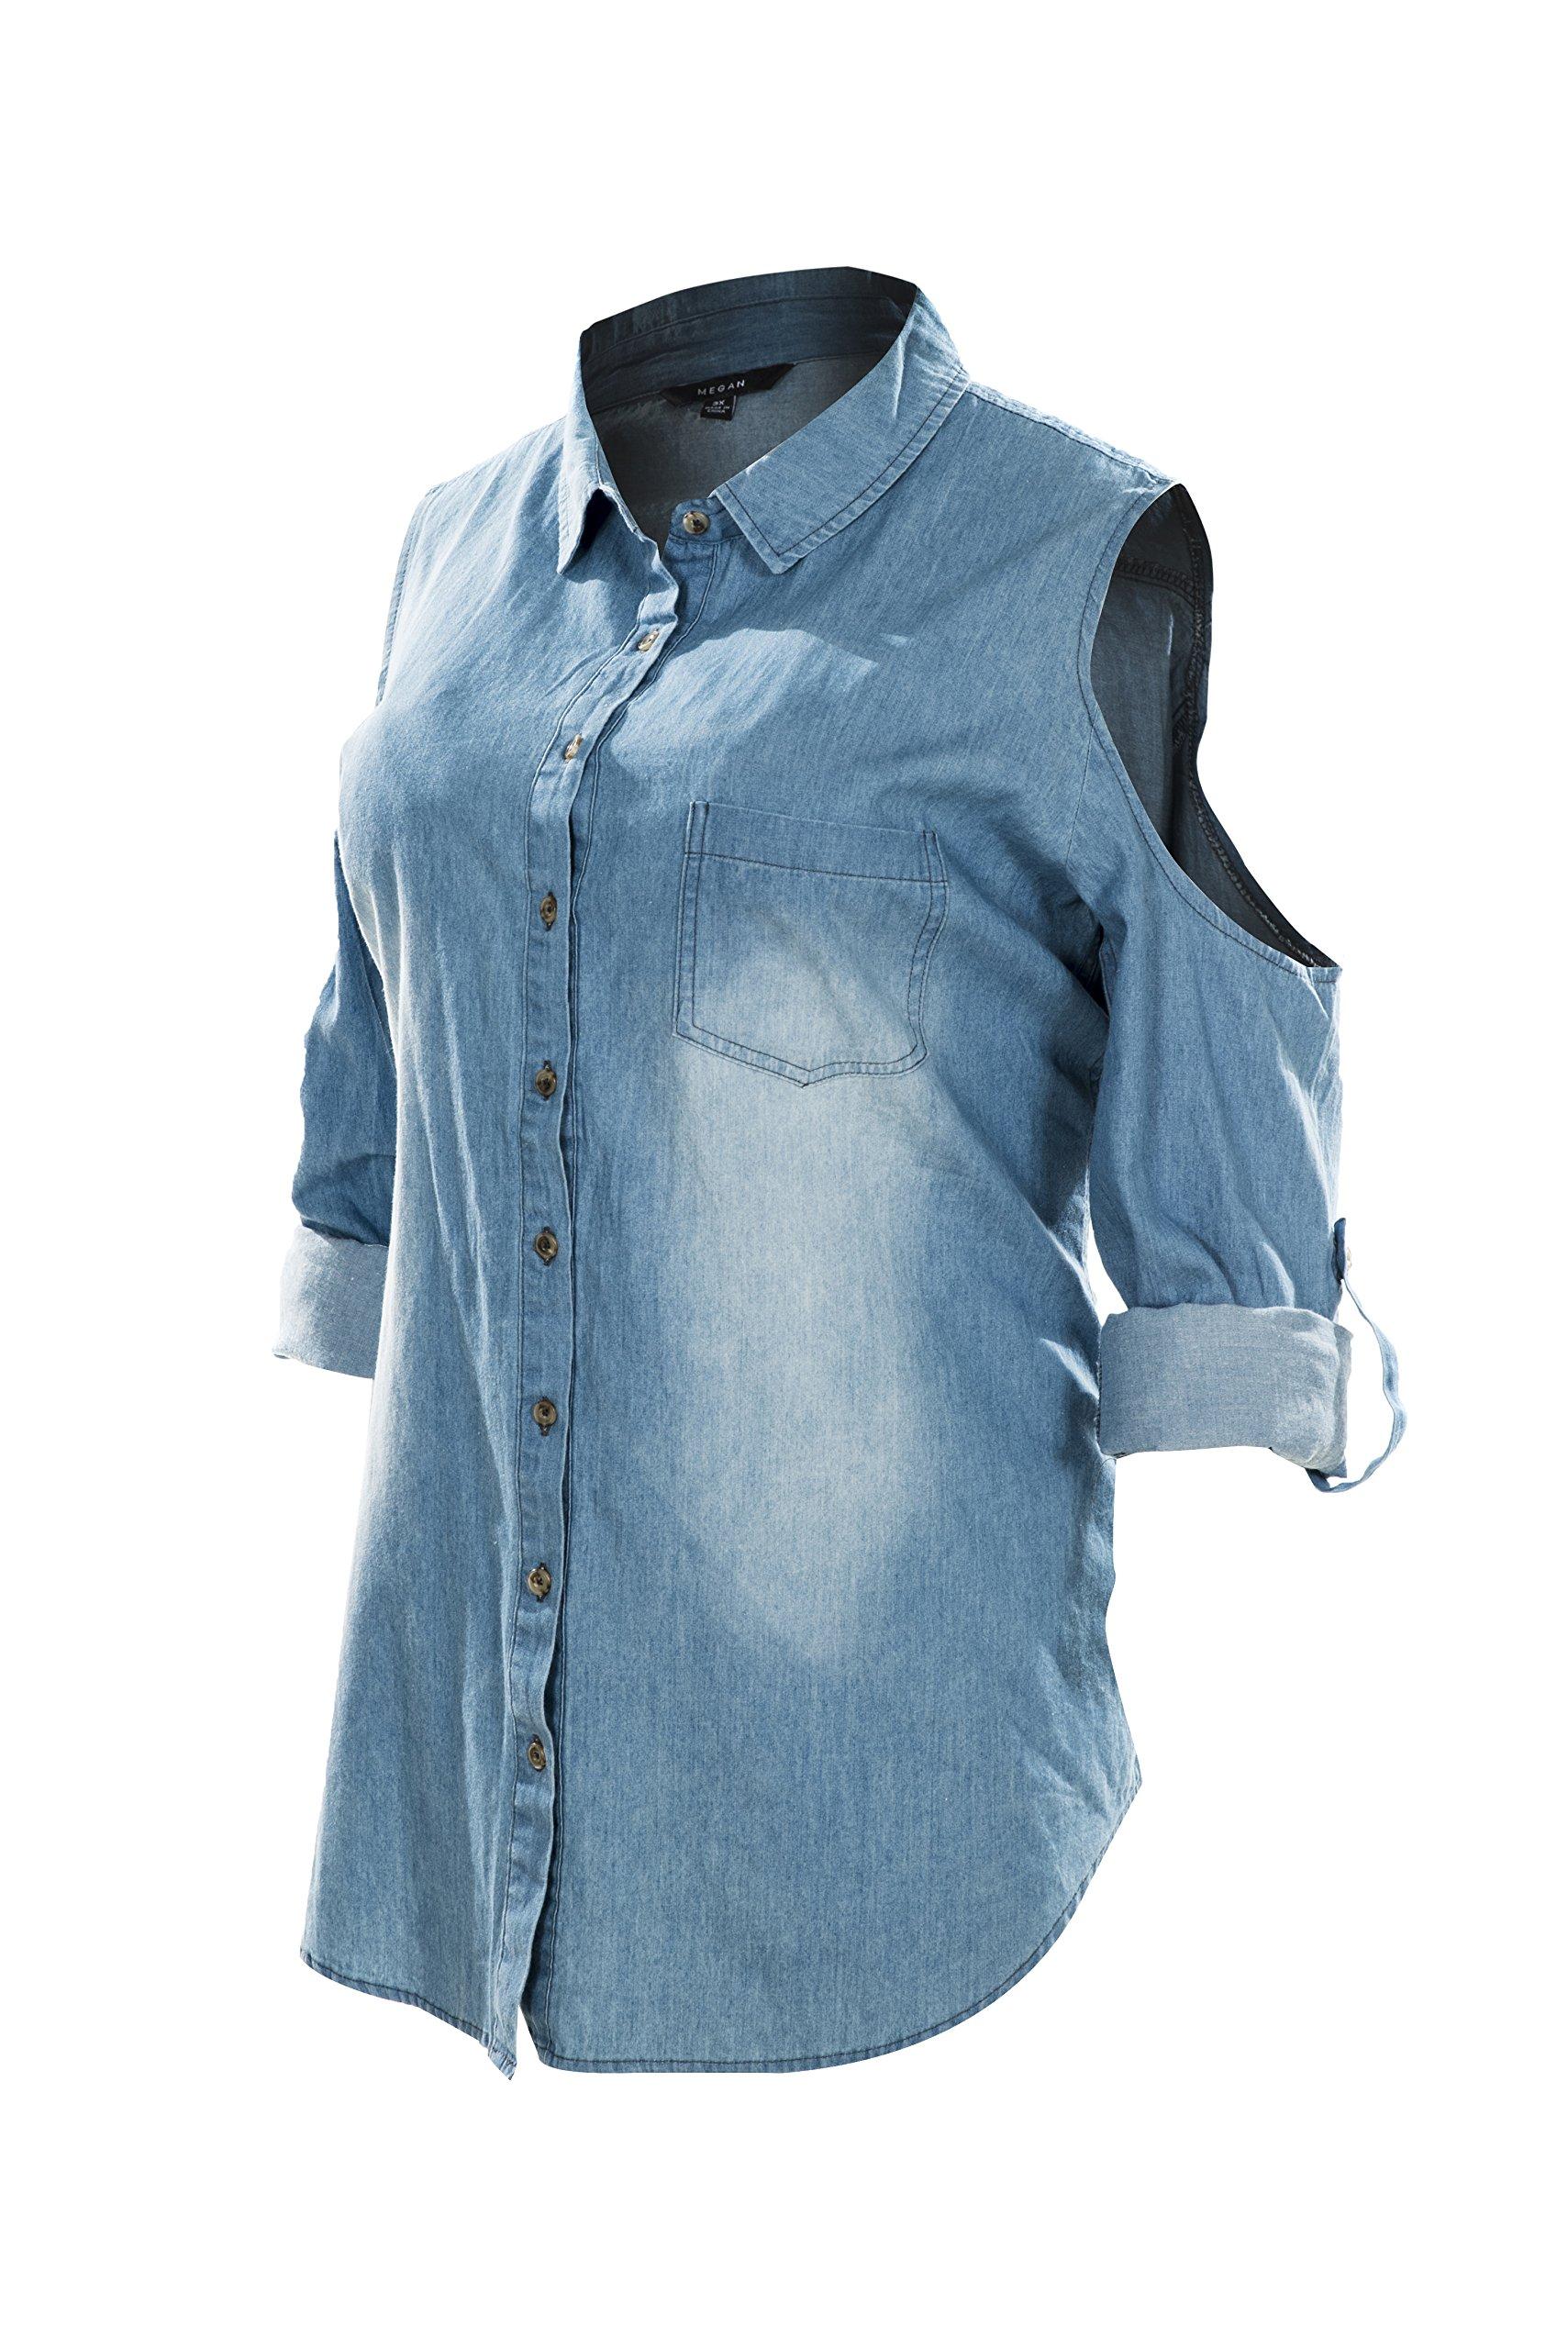 Megan apparel Women's Cut Out Shoulder Roll up Long Sleeve Washed Denim Shirts Plus Size